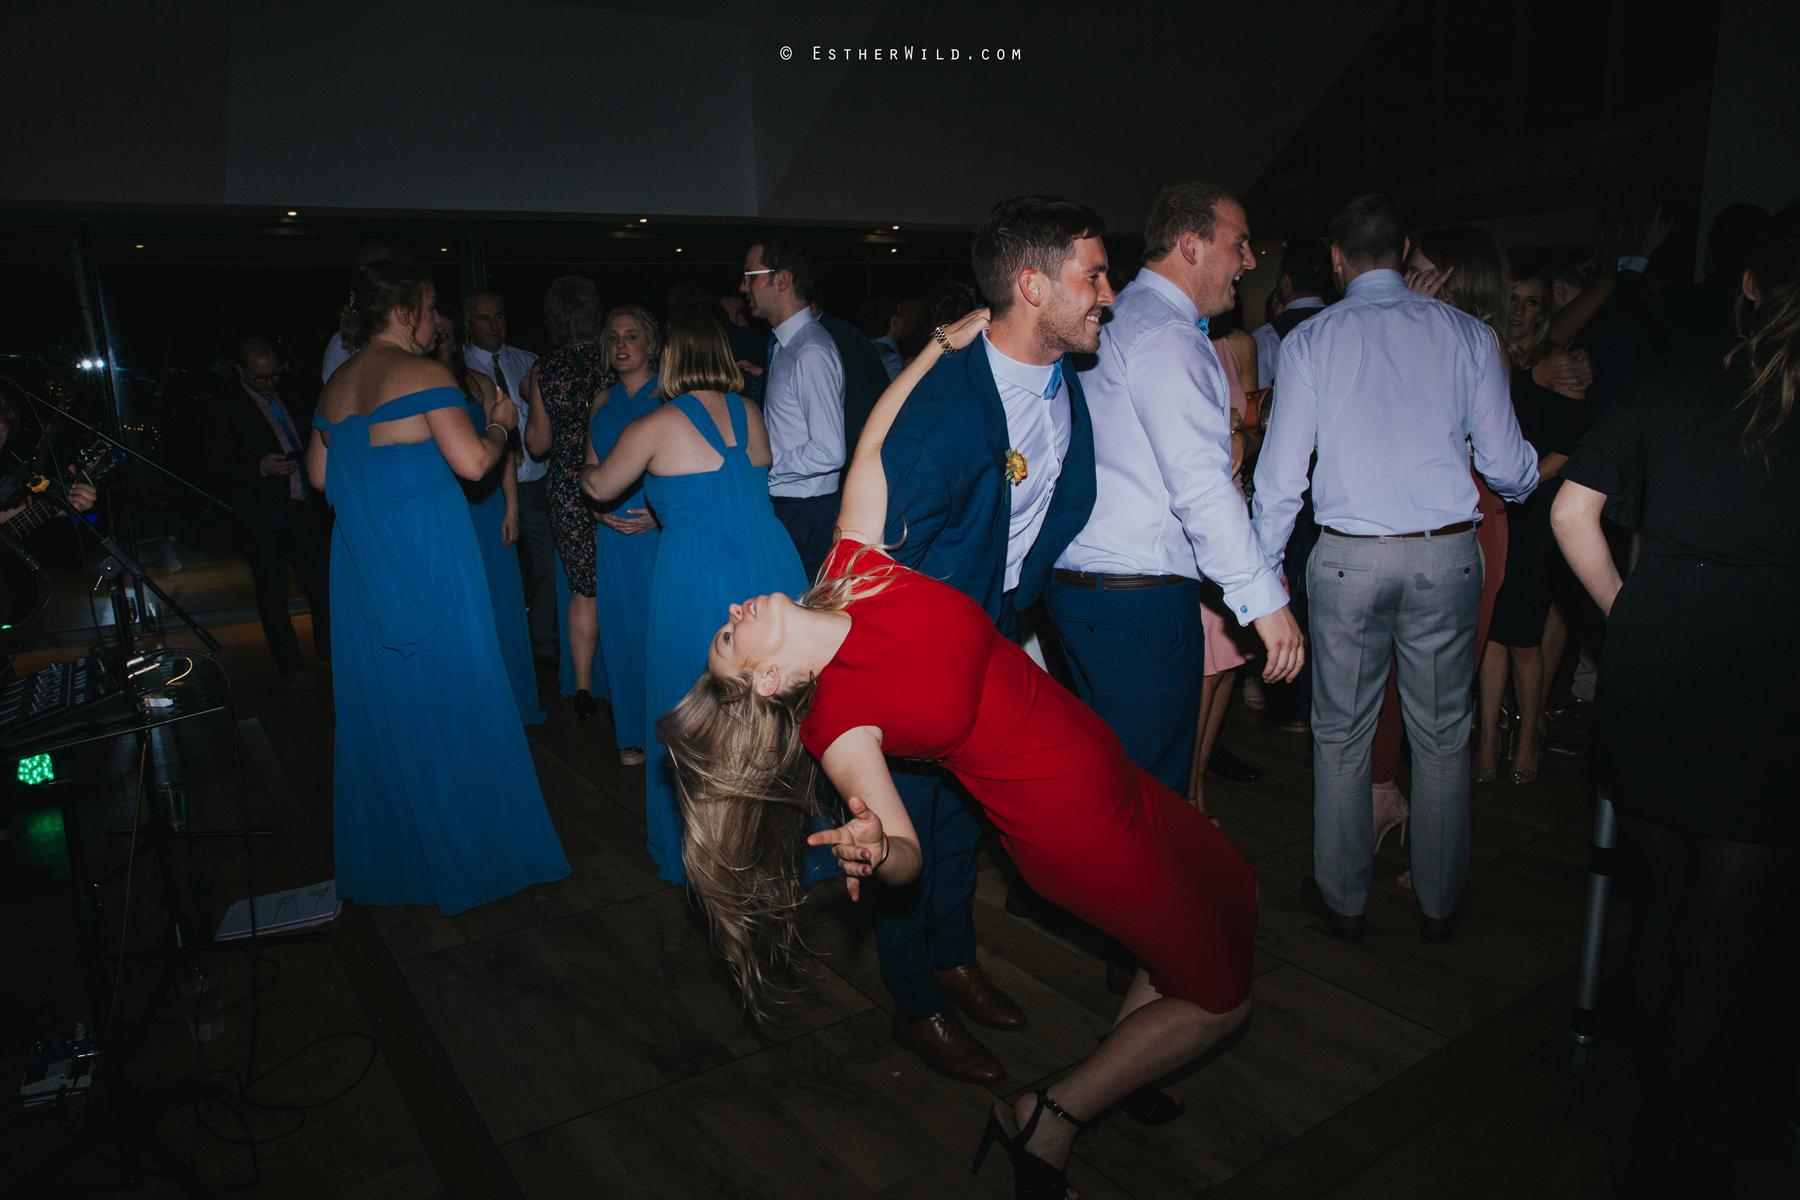 The_BoatHouse_Wedding_Venue_Ormesby_Norfolk_Broads_Boat_Wedding_Photography_Esther_Wild_Photographer_IMG_3658.jpg